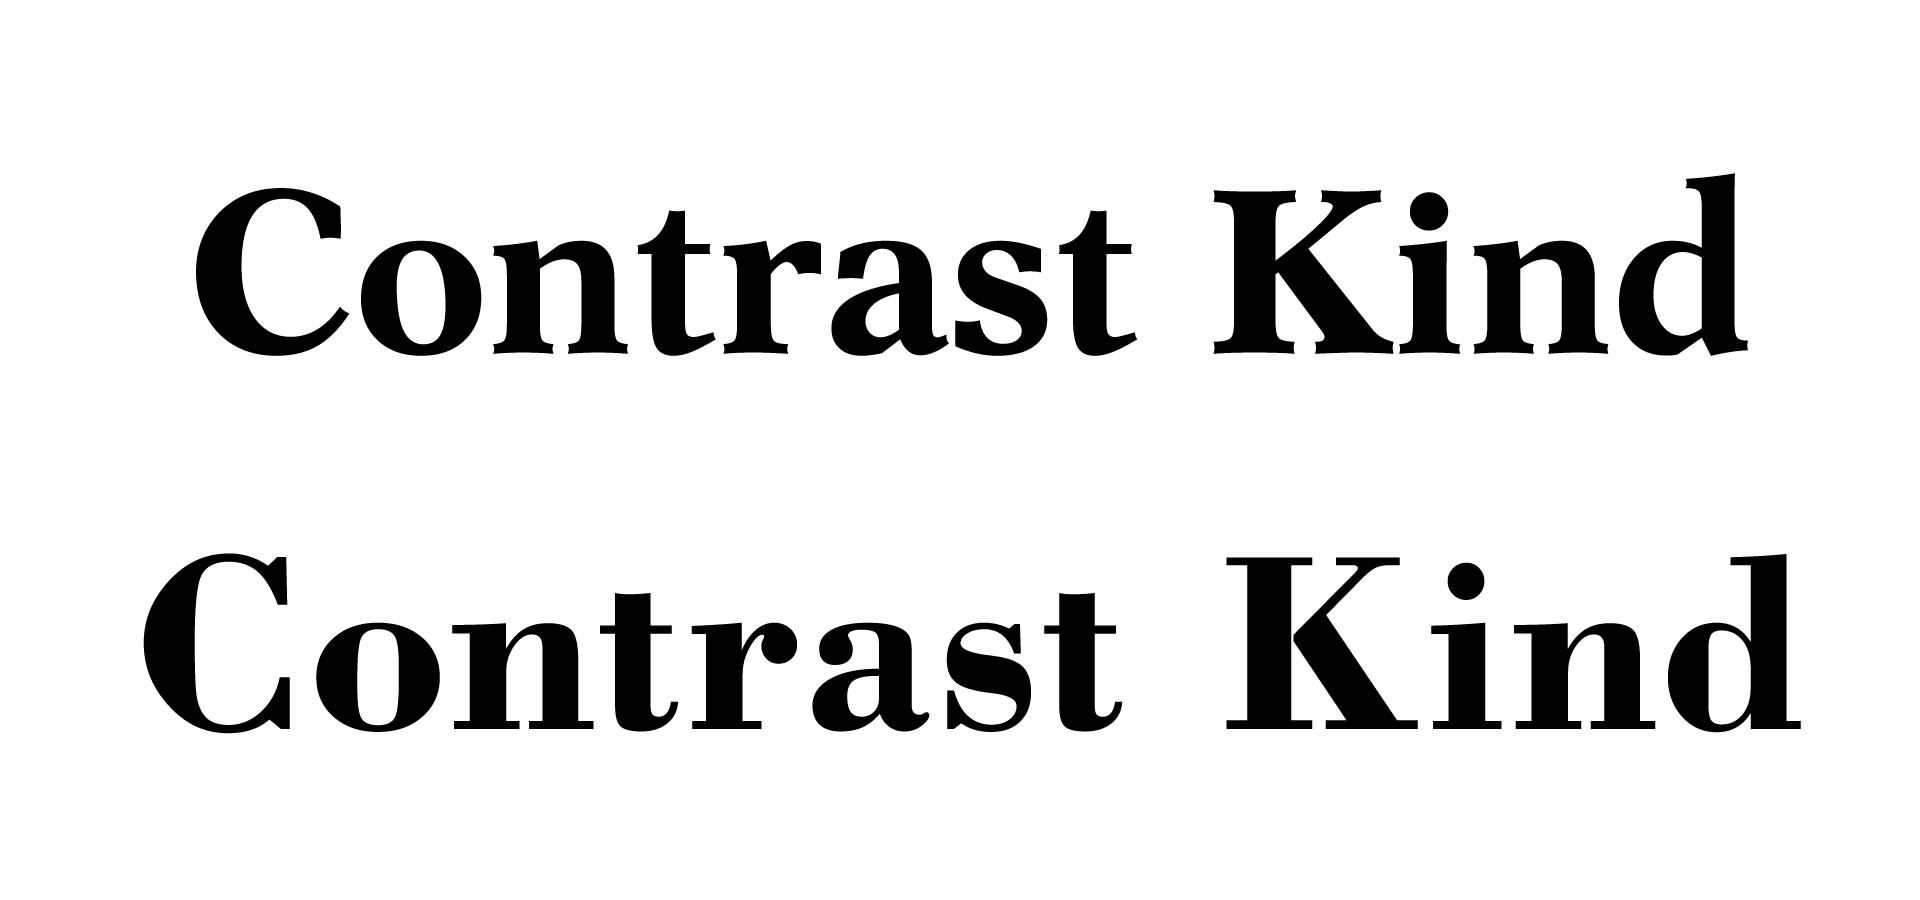 Contrast kind